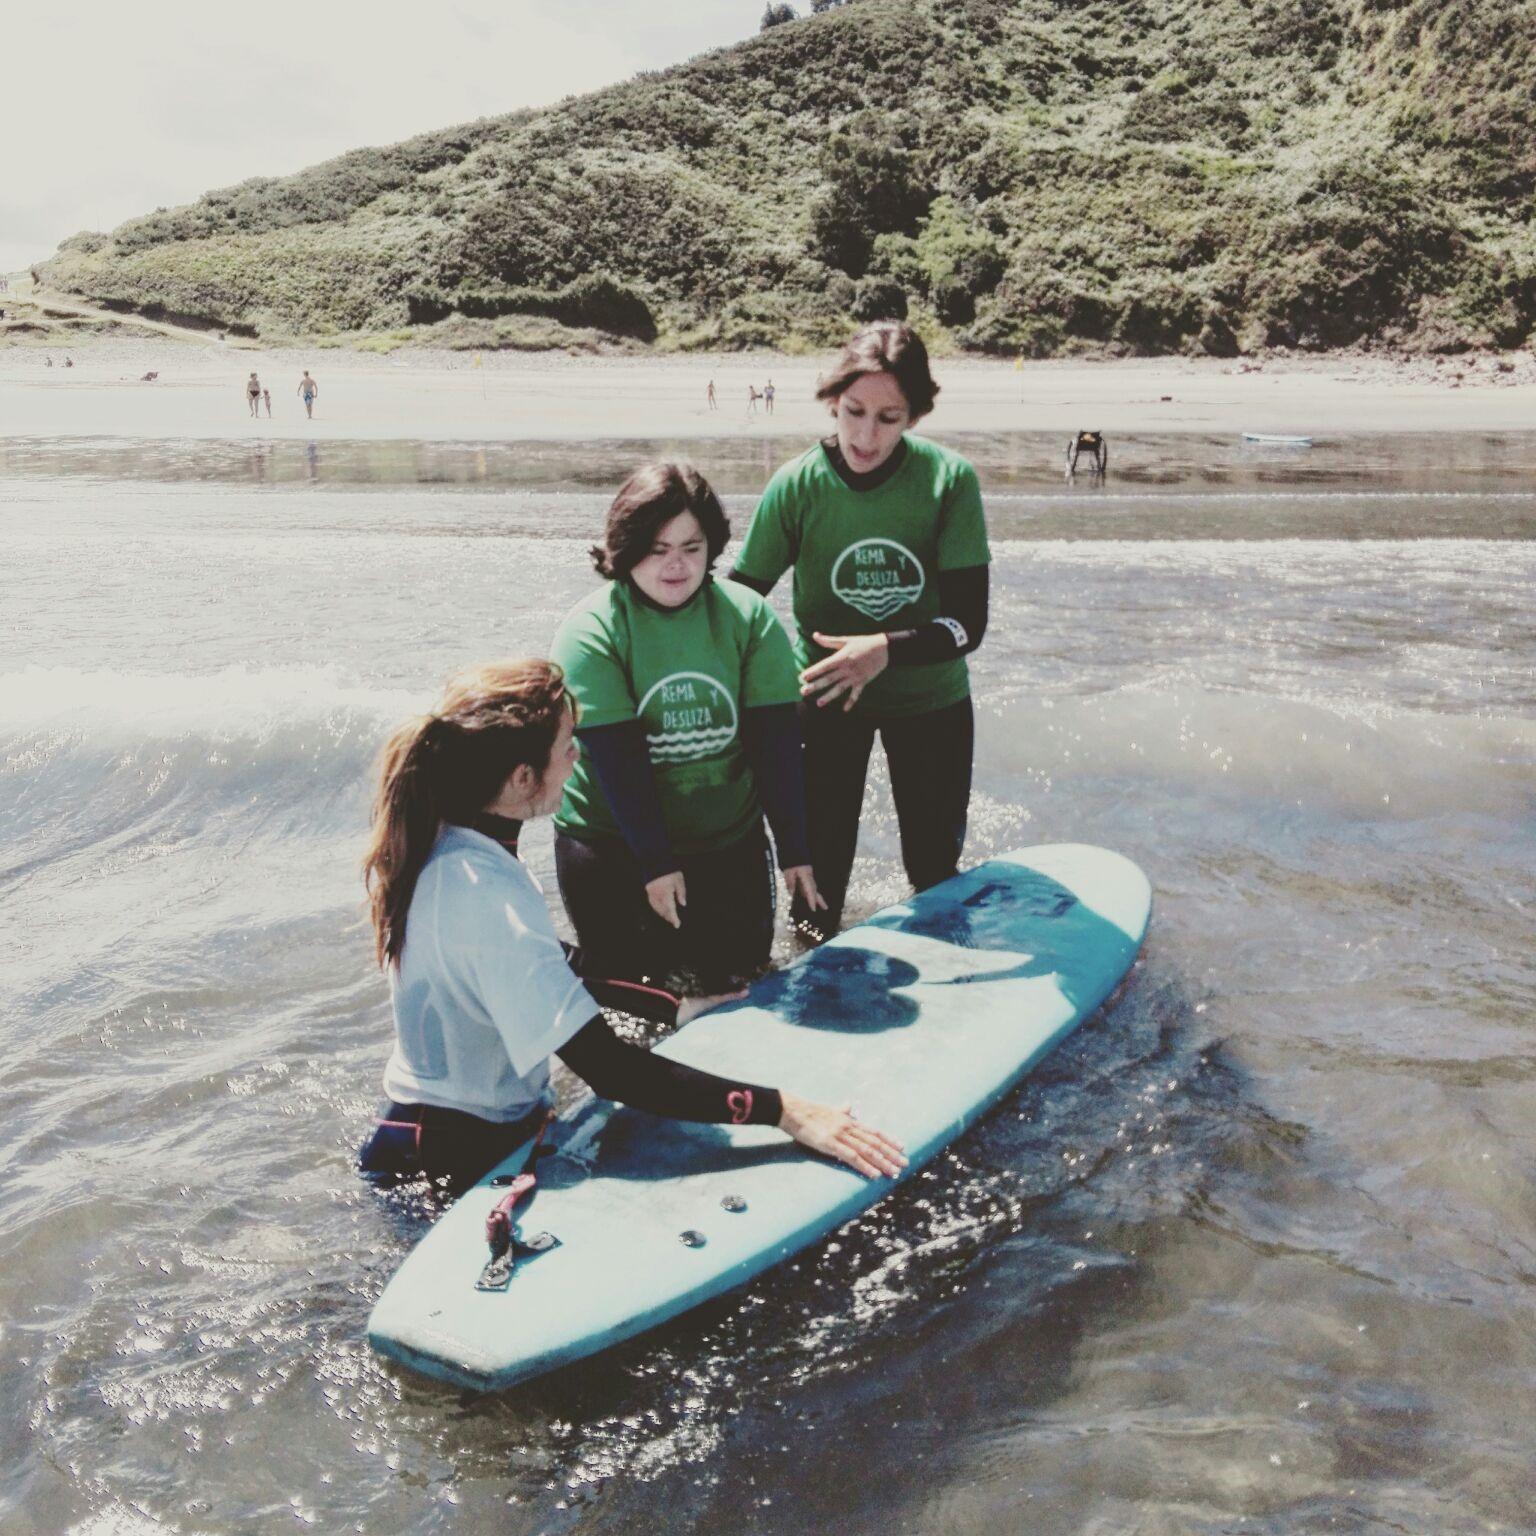 Monitora de surf con alumna con síndrome de down